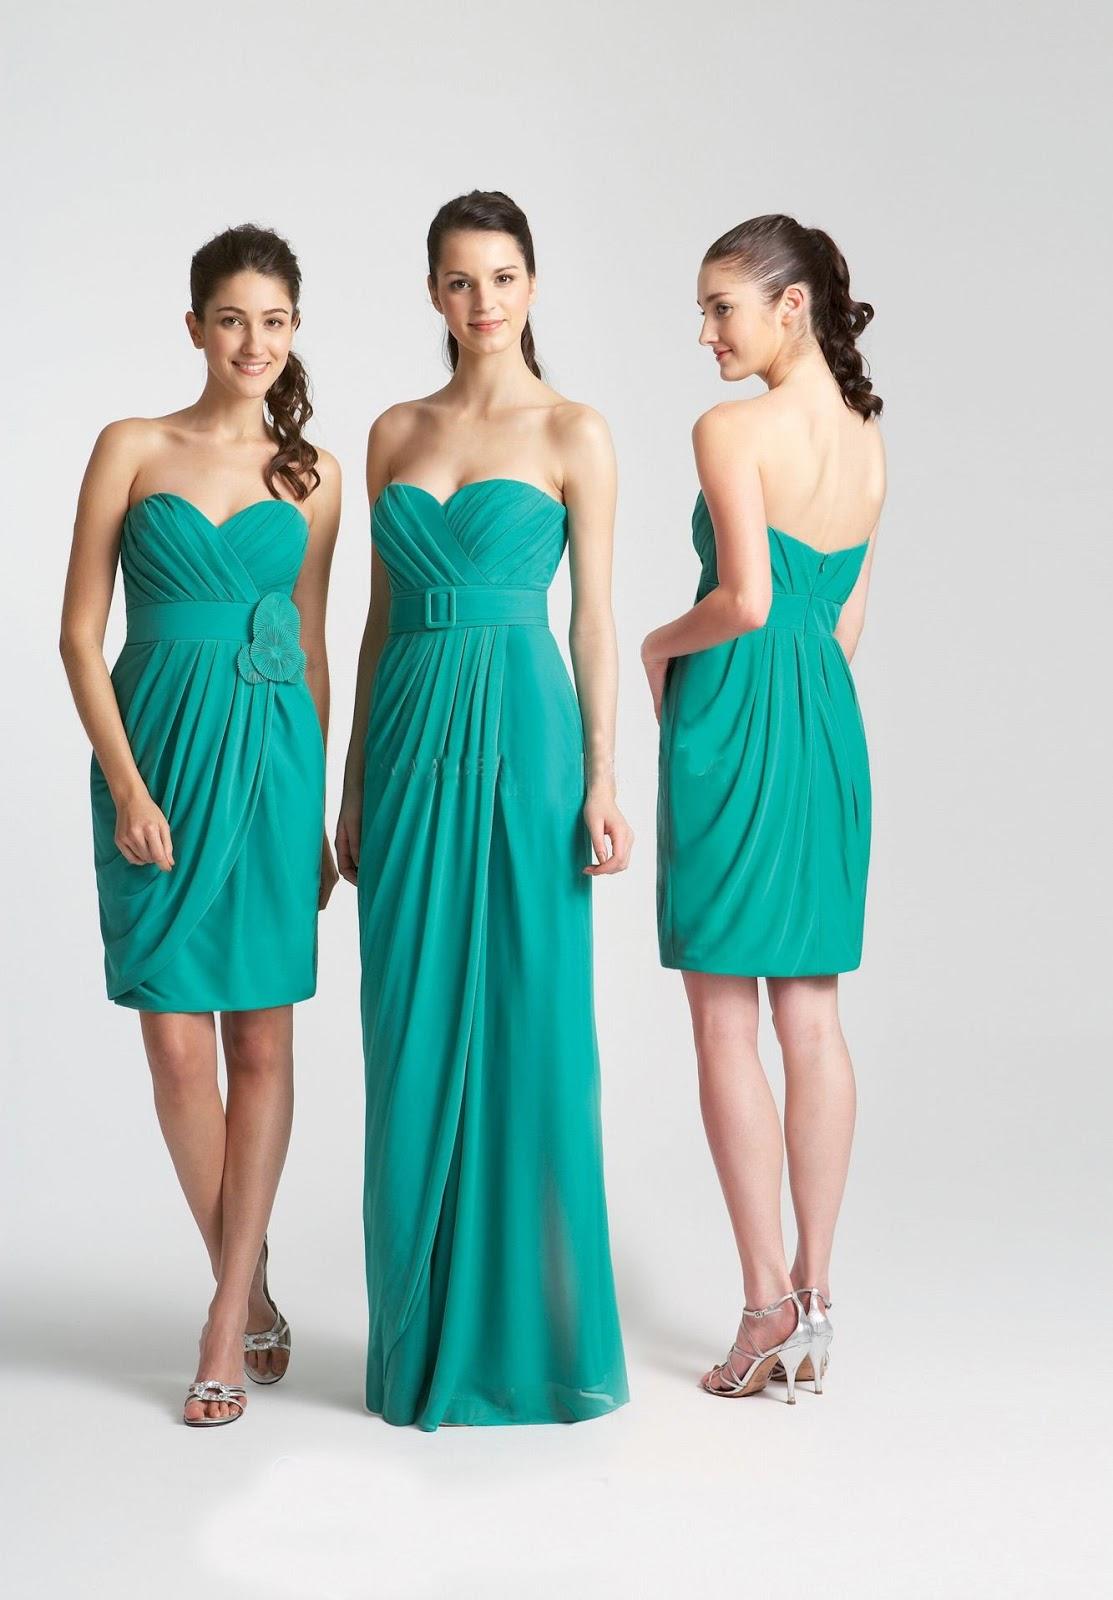 WhiteAzalea Bridesmaid Dresses: Fresh Green Bridesmaid Dress